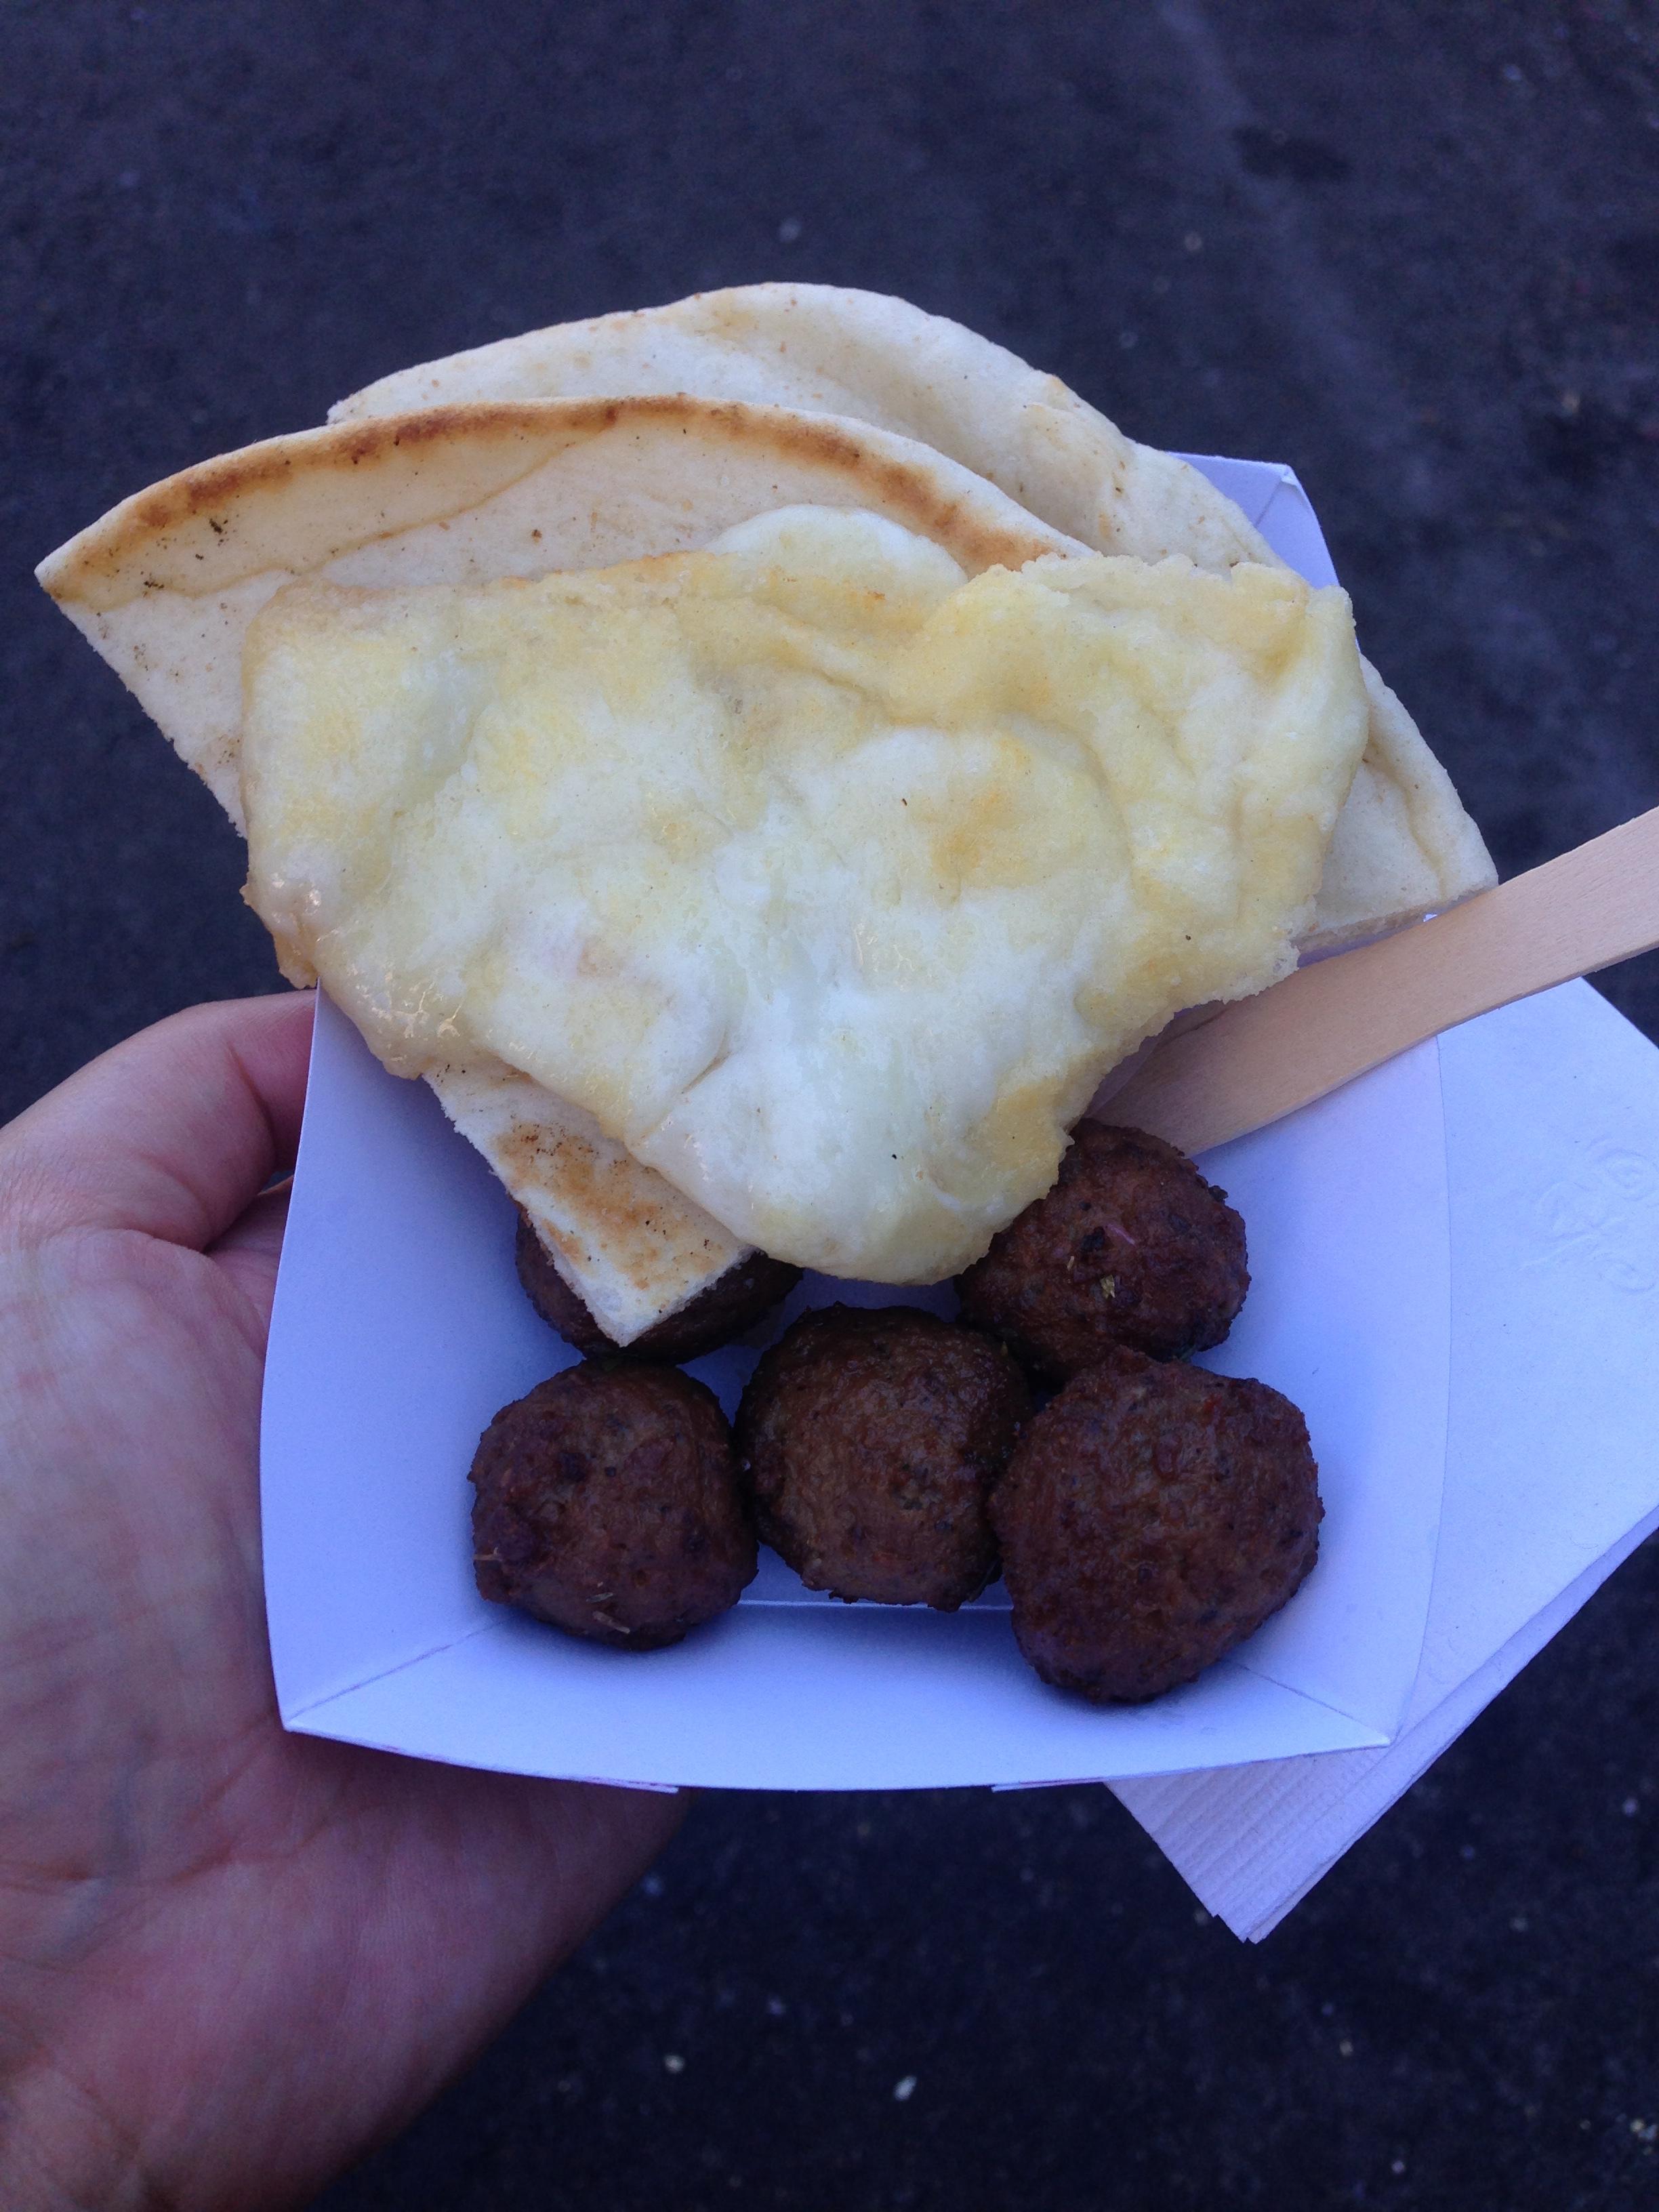 Saganaki and Meatballs at Taste of the Danforth